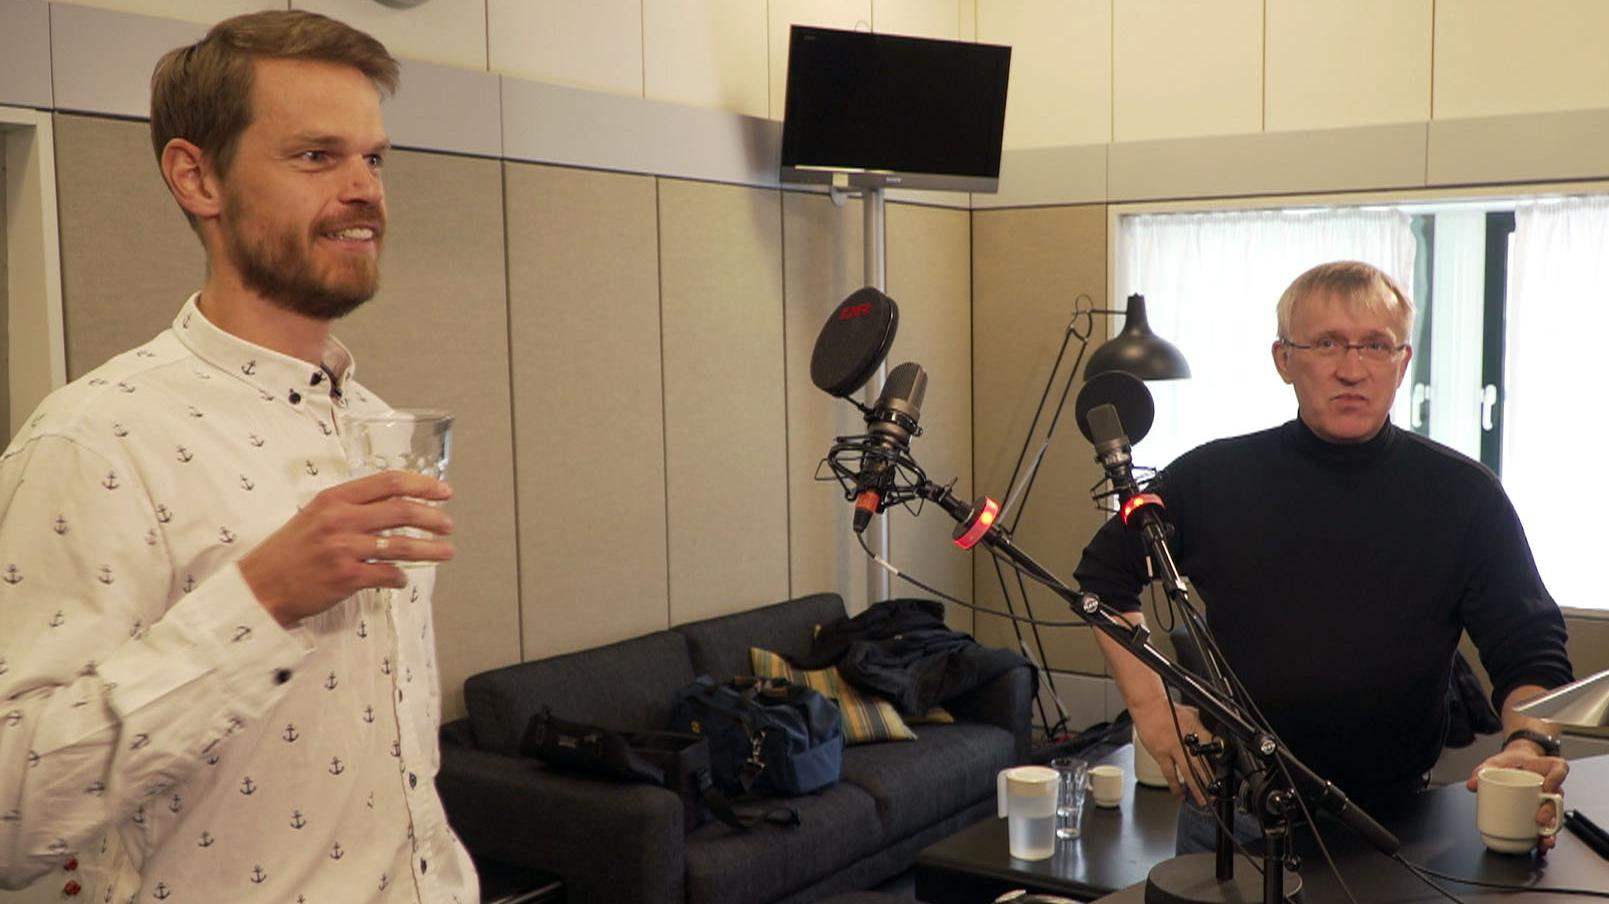 Professor i psykologi Svend Brinkmann (tv) i studiet med robotforsker Henrik Iskov Christensen.